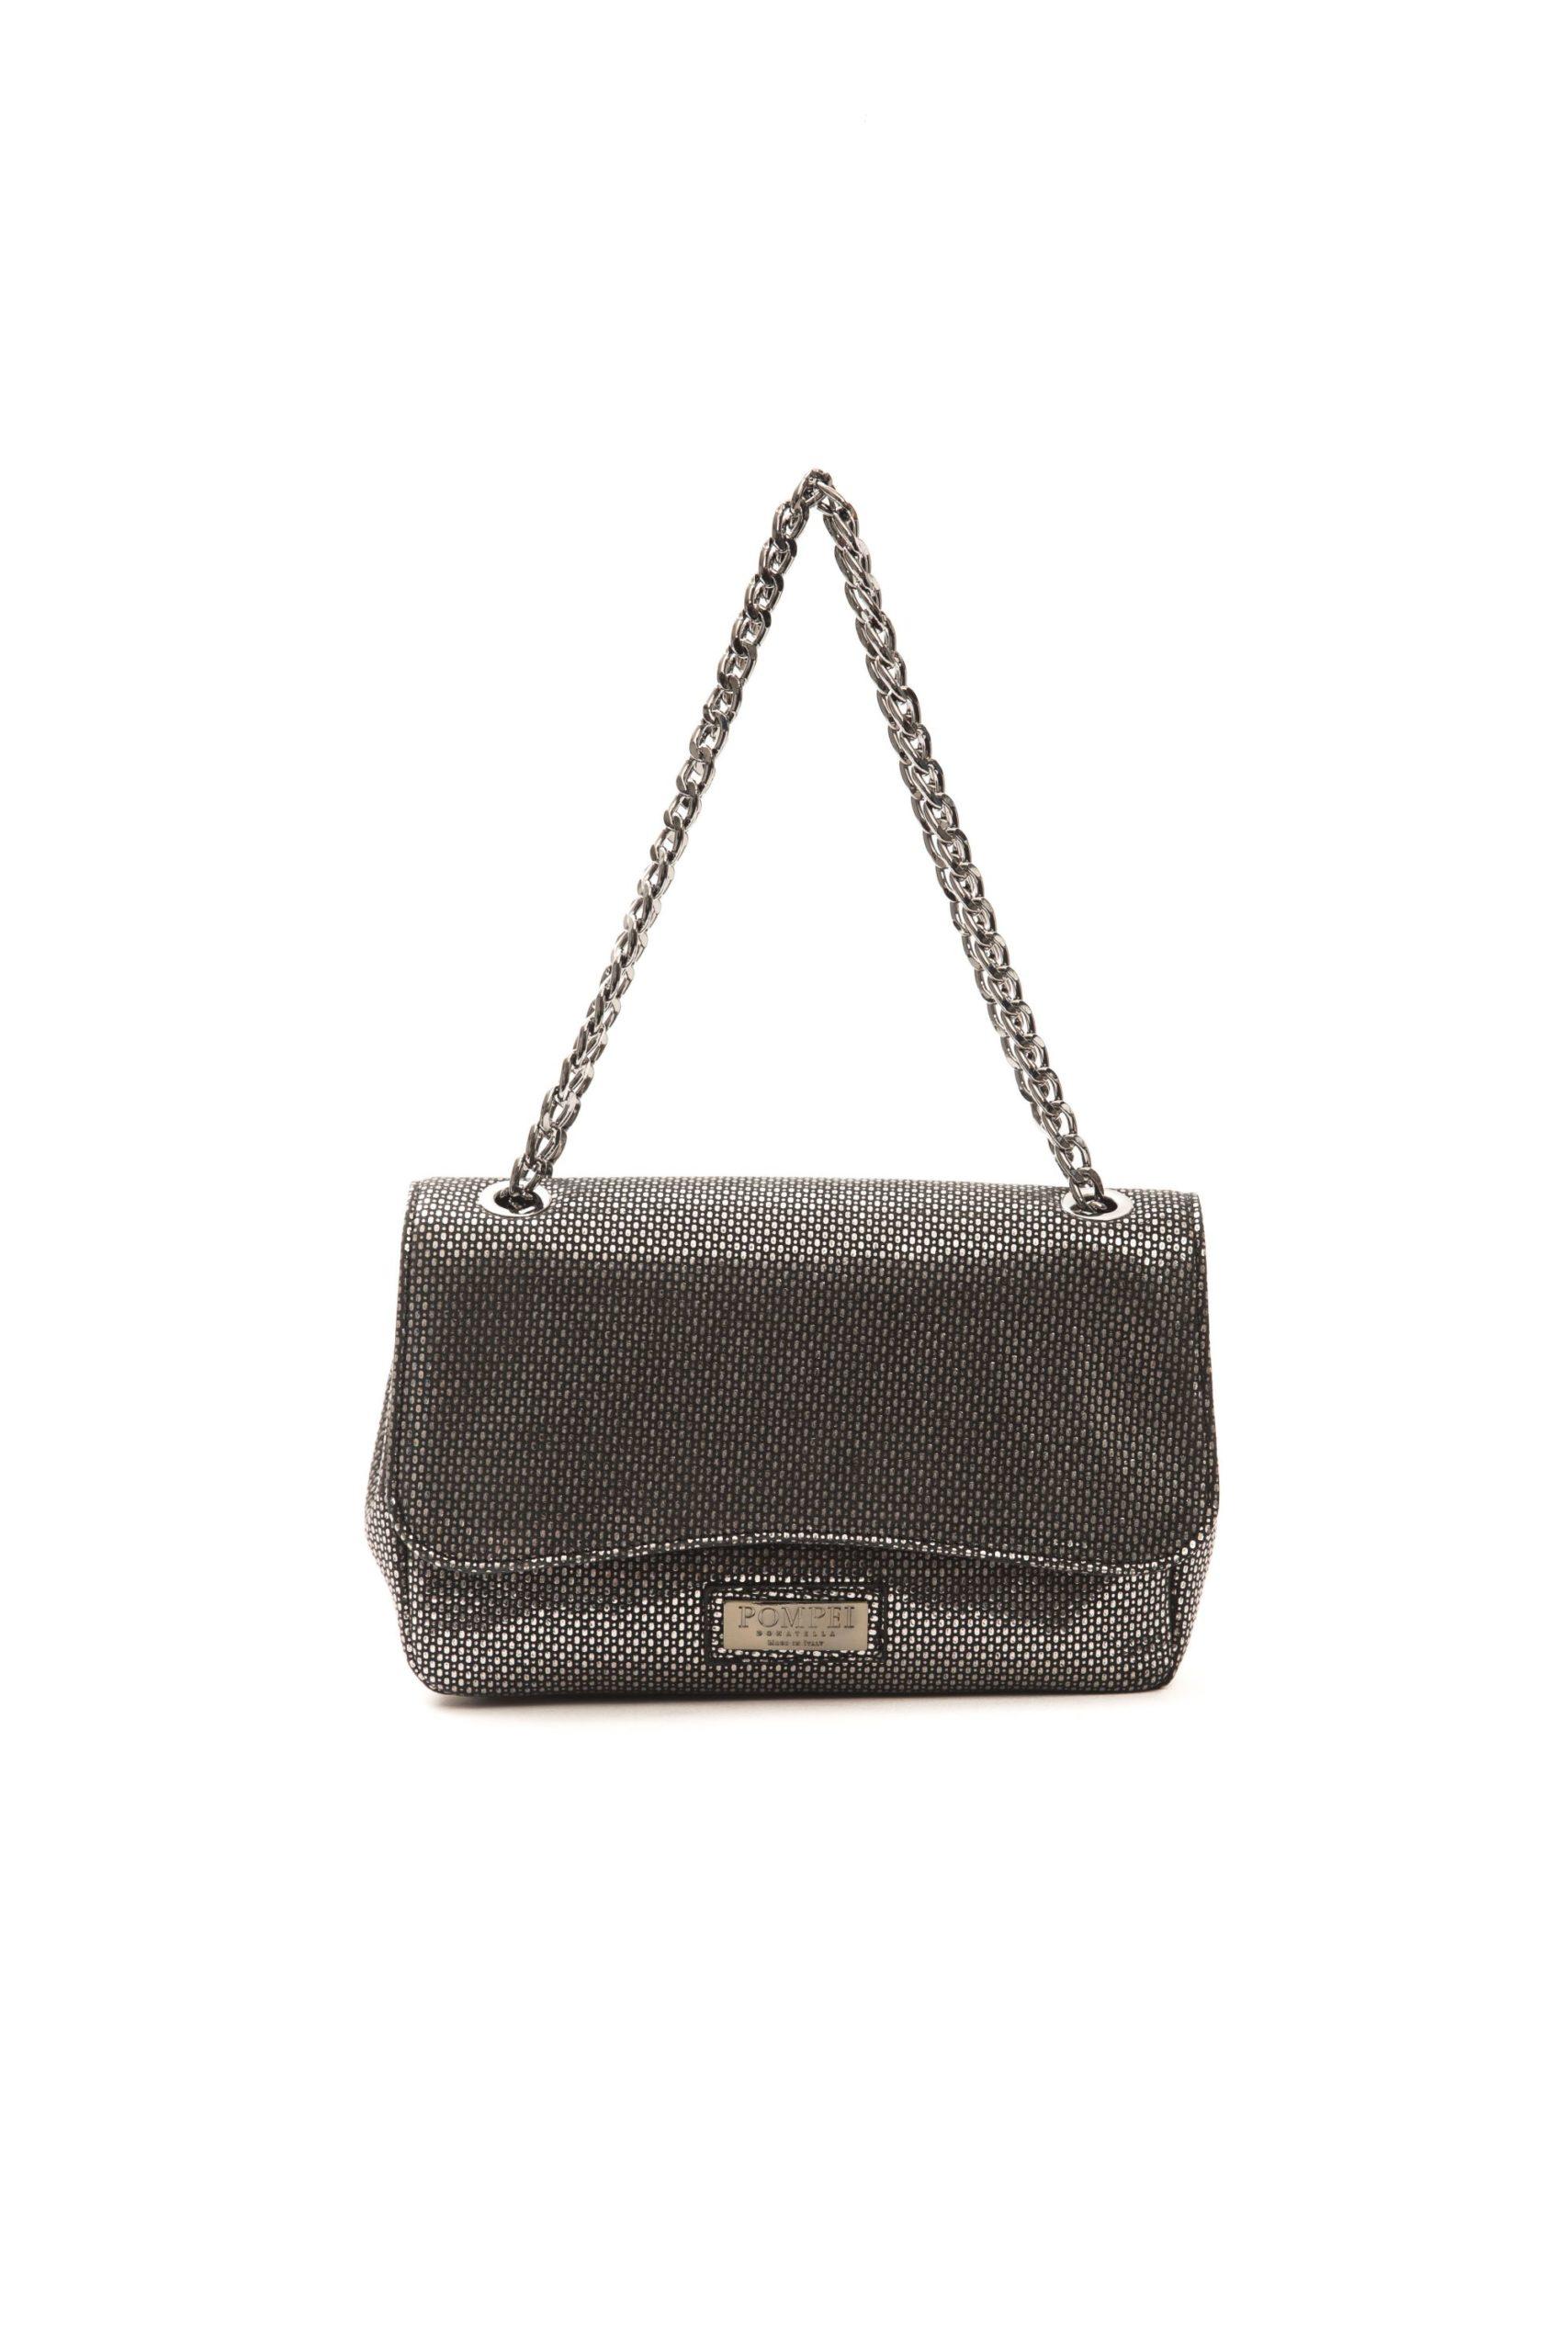 Pompei Donatella Women's Grigio Crossbody Bag Grey PO1005189